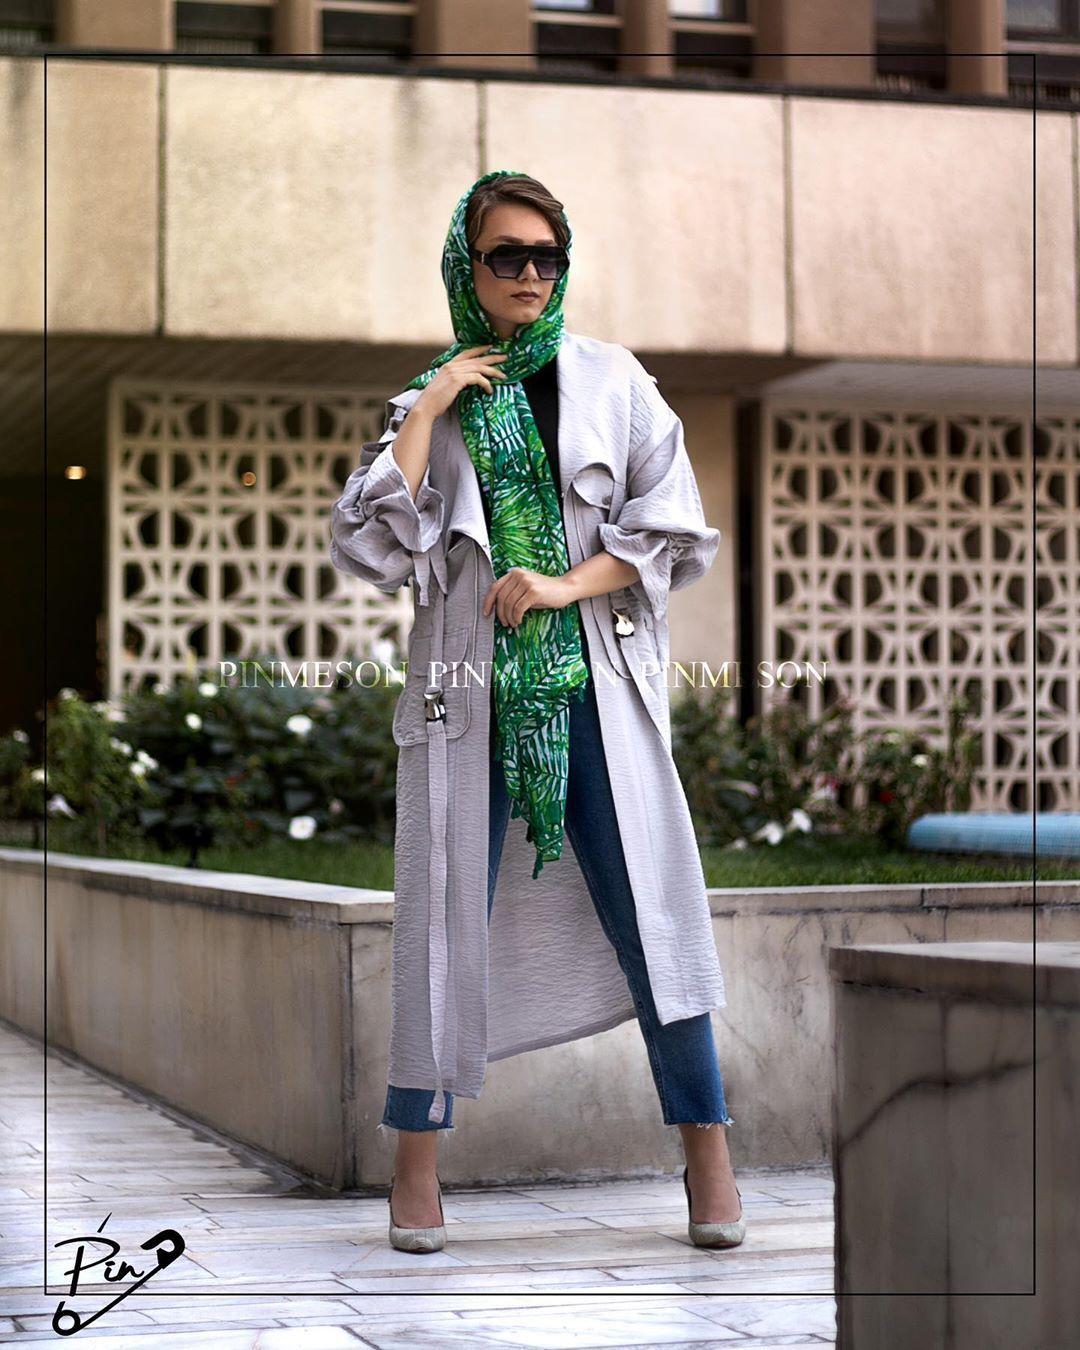 Code 10103 مانتو بنتون ژیله پیله طوسی رنگبندی طوسی Free سایزبندی قیمت T 145 000 تحویل ۲ ساعت در تهر Photography Women Fashion Women